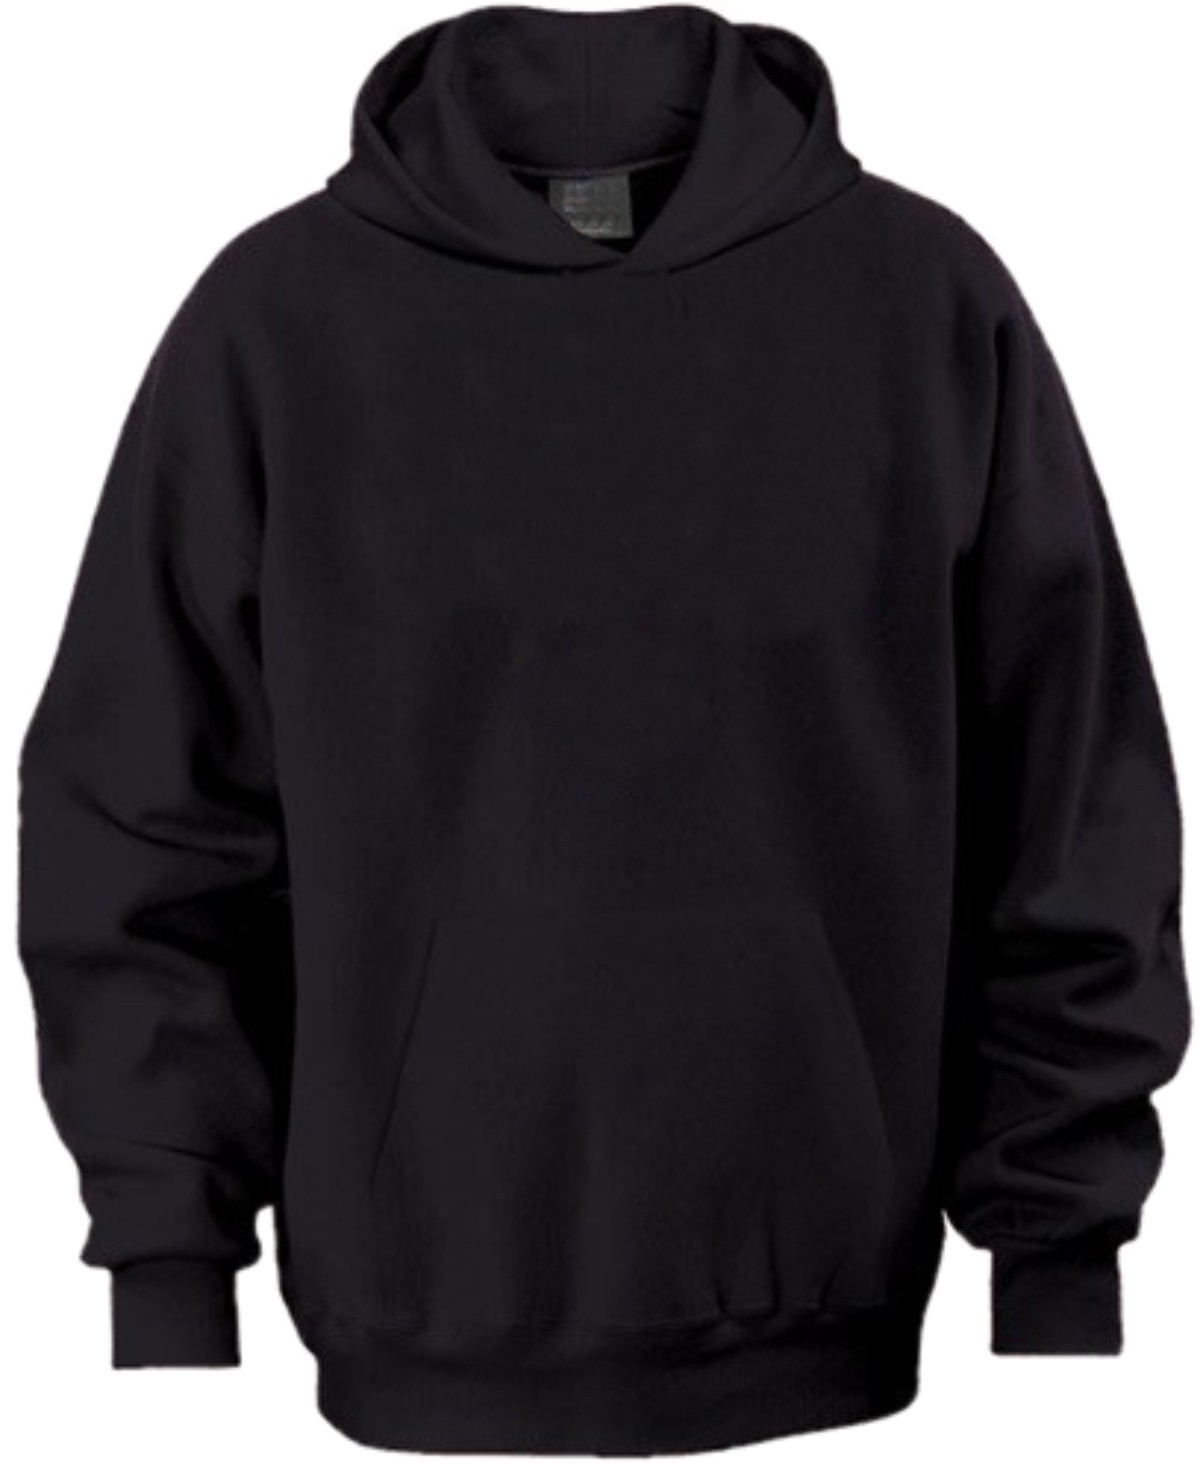 Black sweatshirt template back